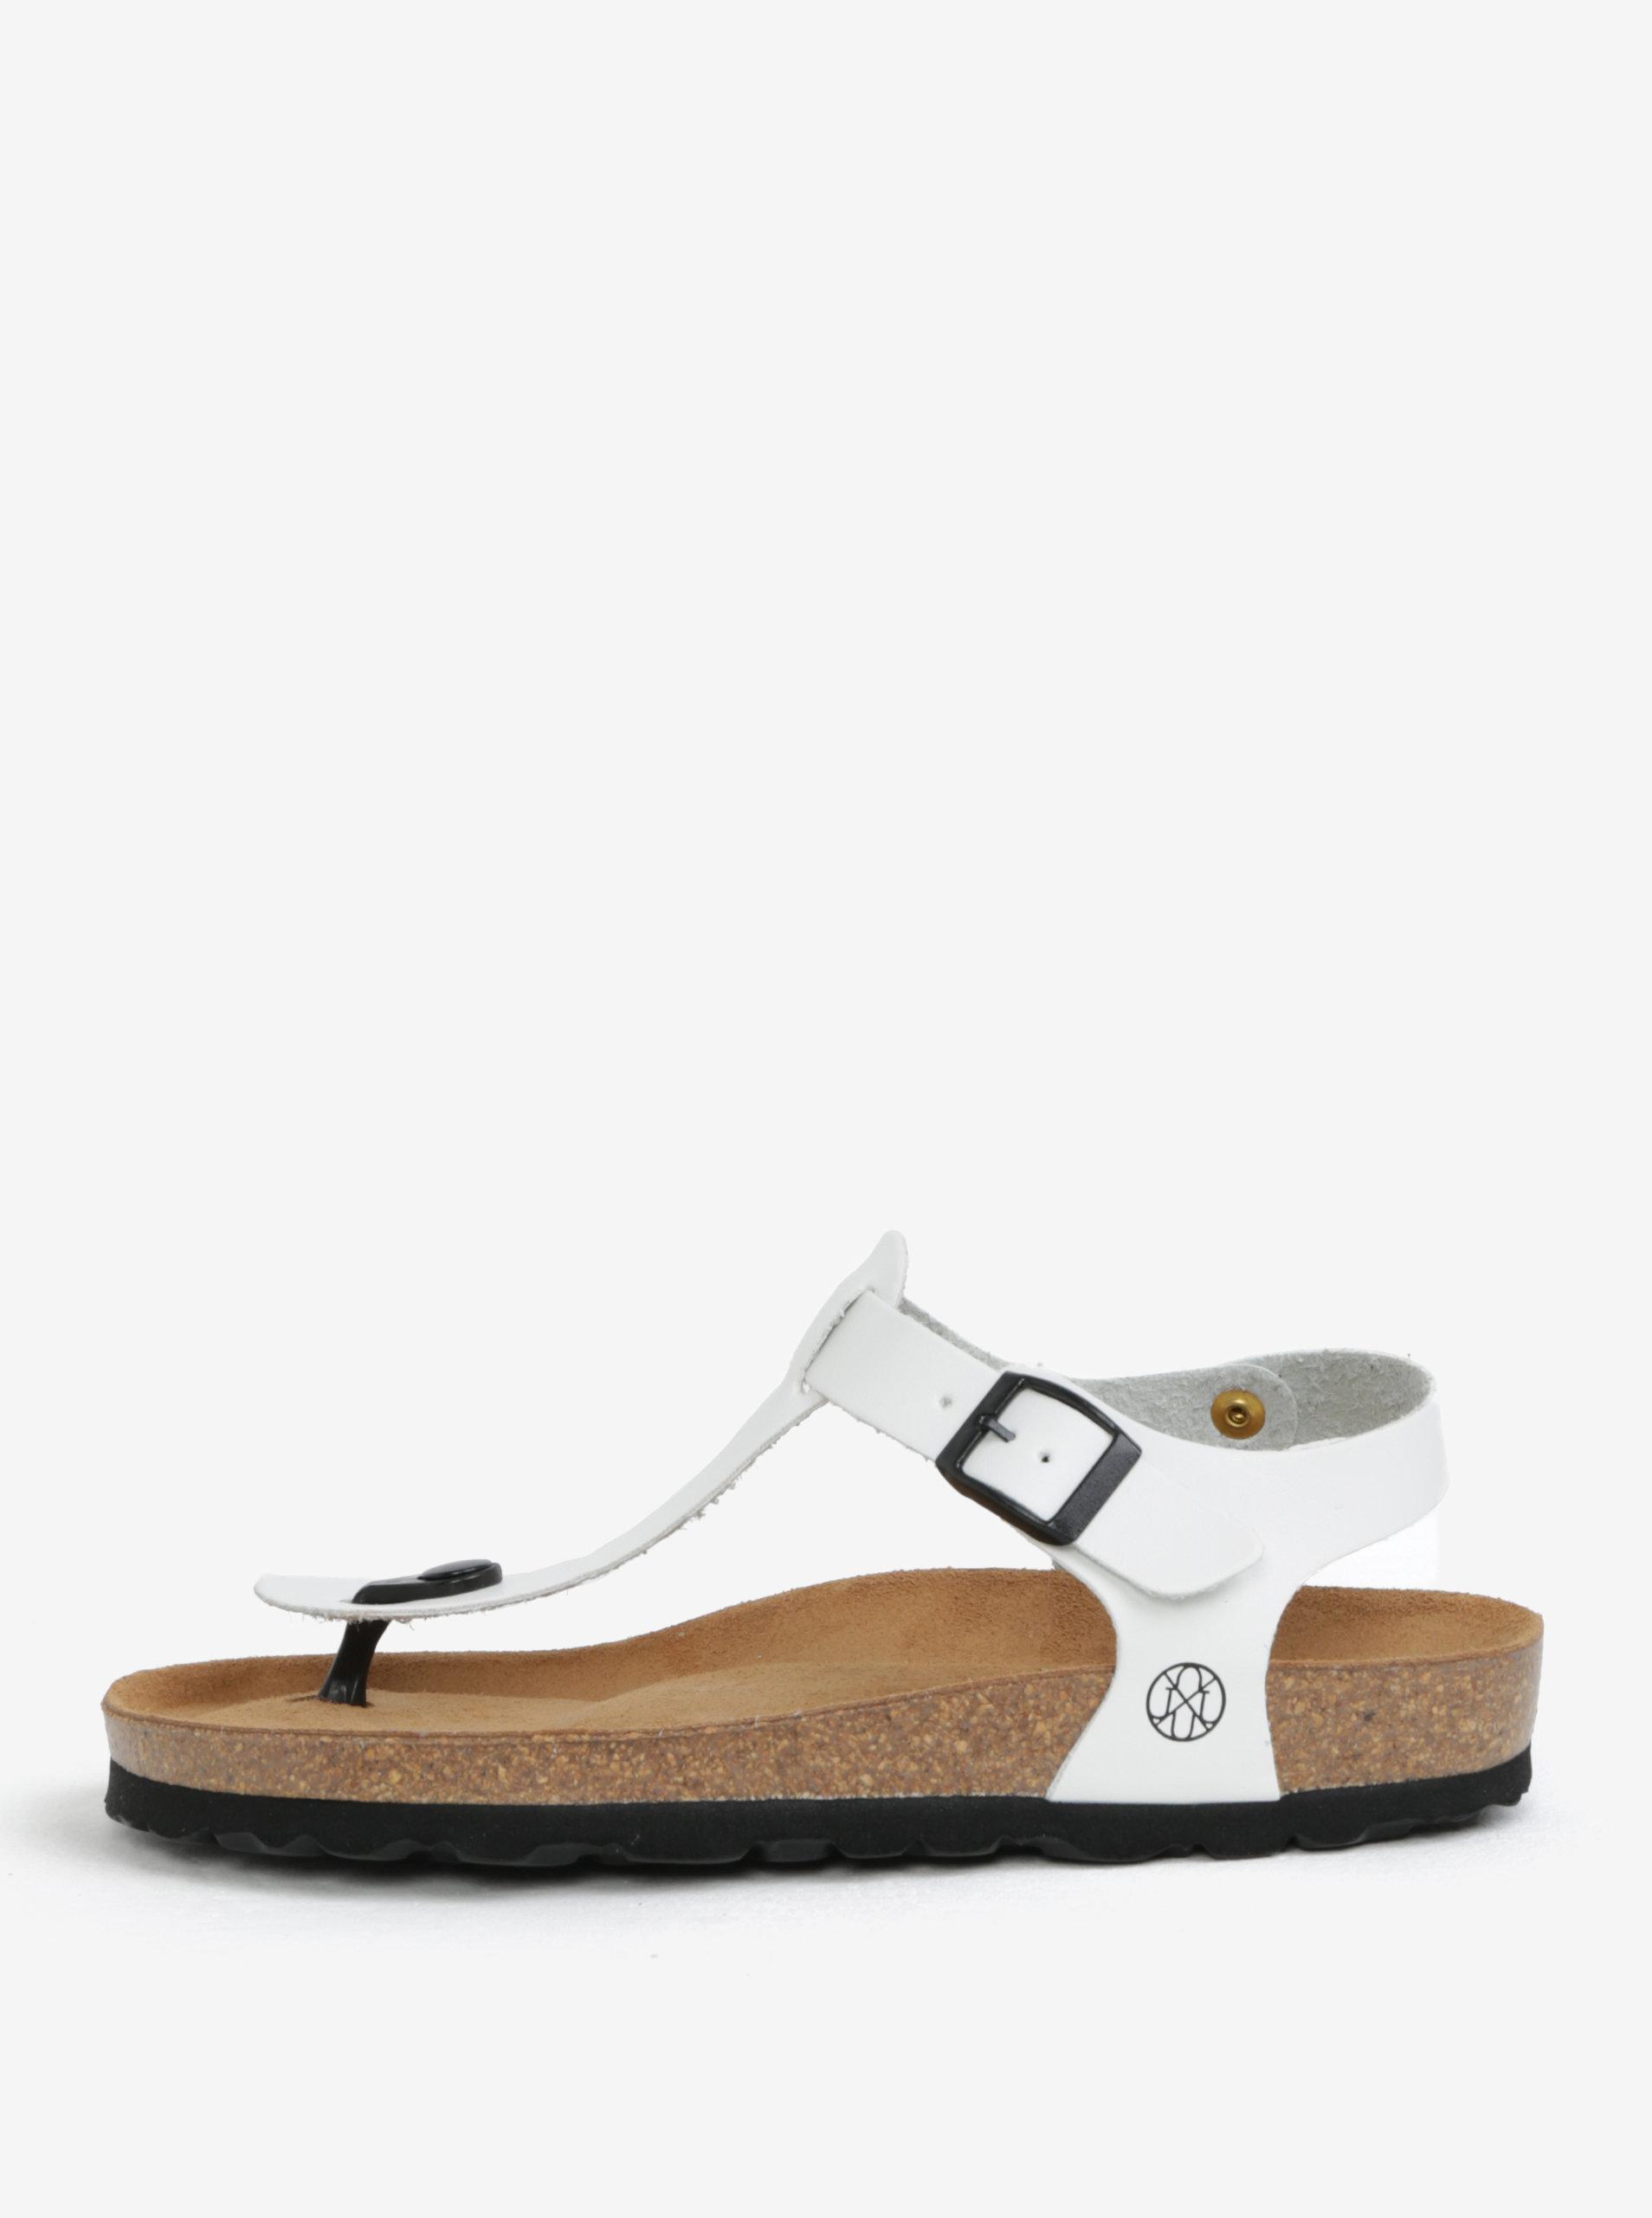 c72be00c7121 Biele sandále OJJU ...